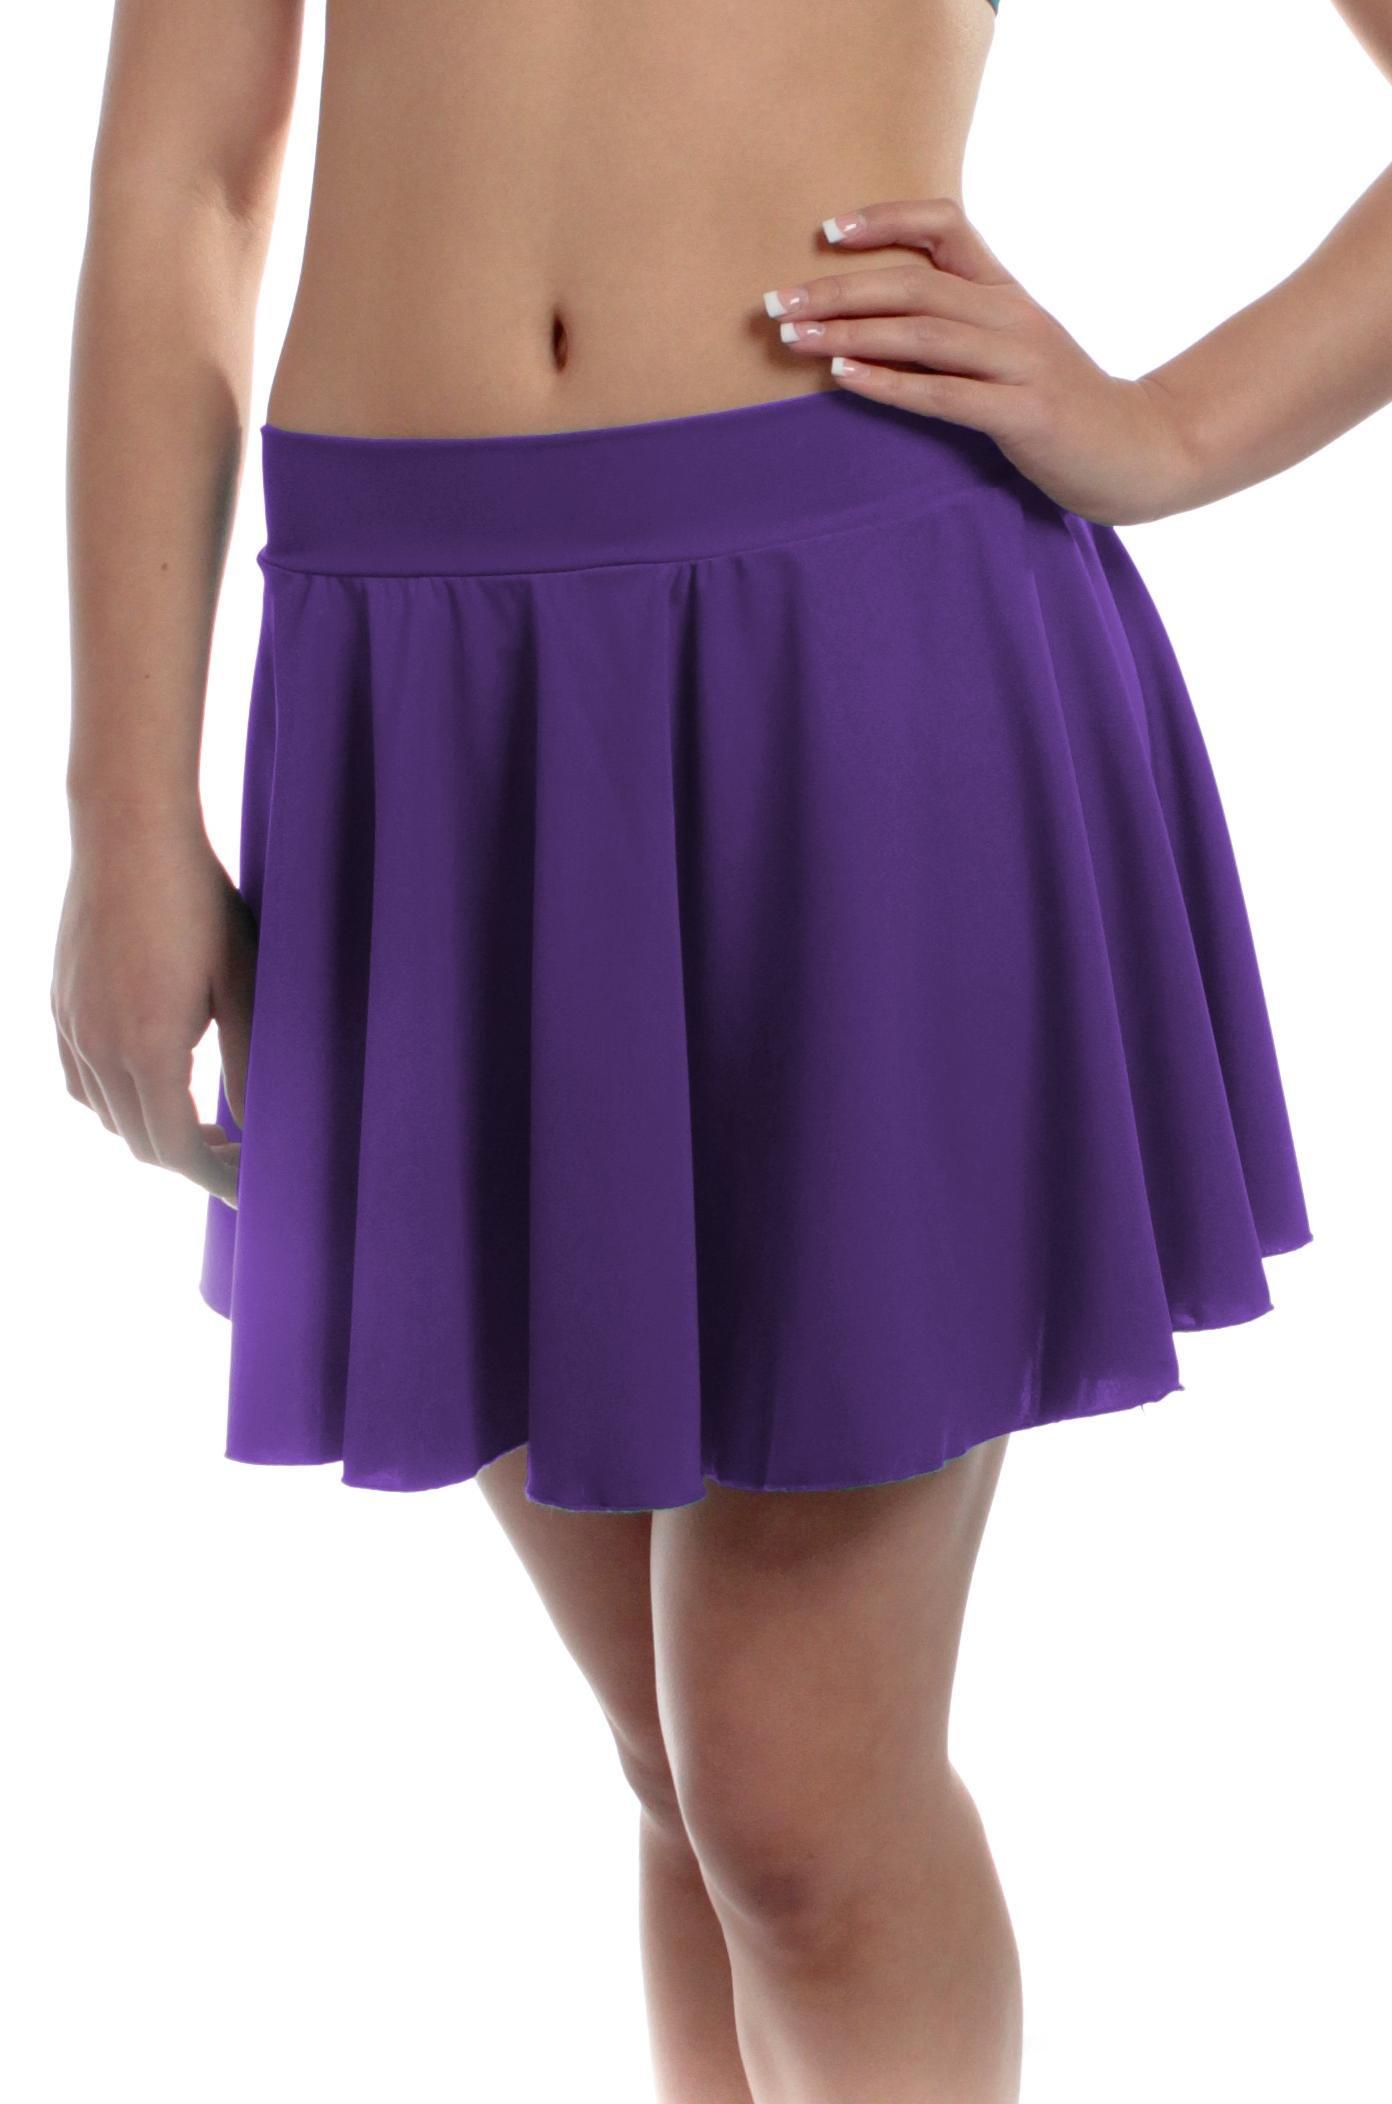 B Dancewear Girls Circle Dance Skirt X-Large Purple Child and Kid Sizes by B Dancewear